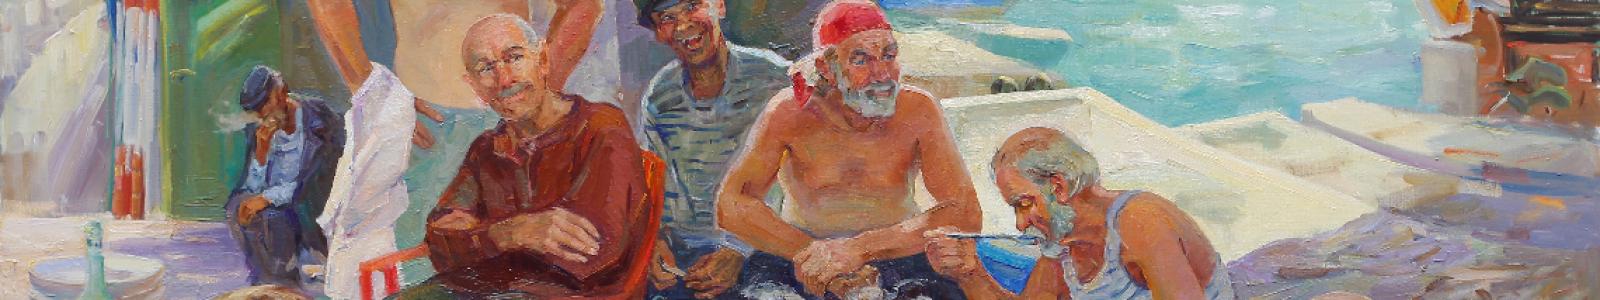 Gallery Painter Juliya Kolaktionova